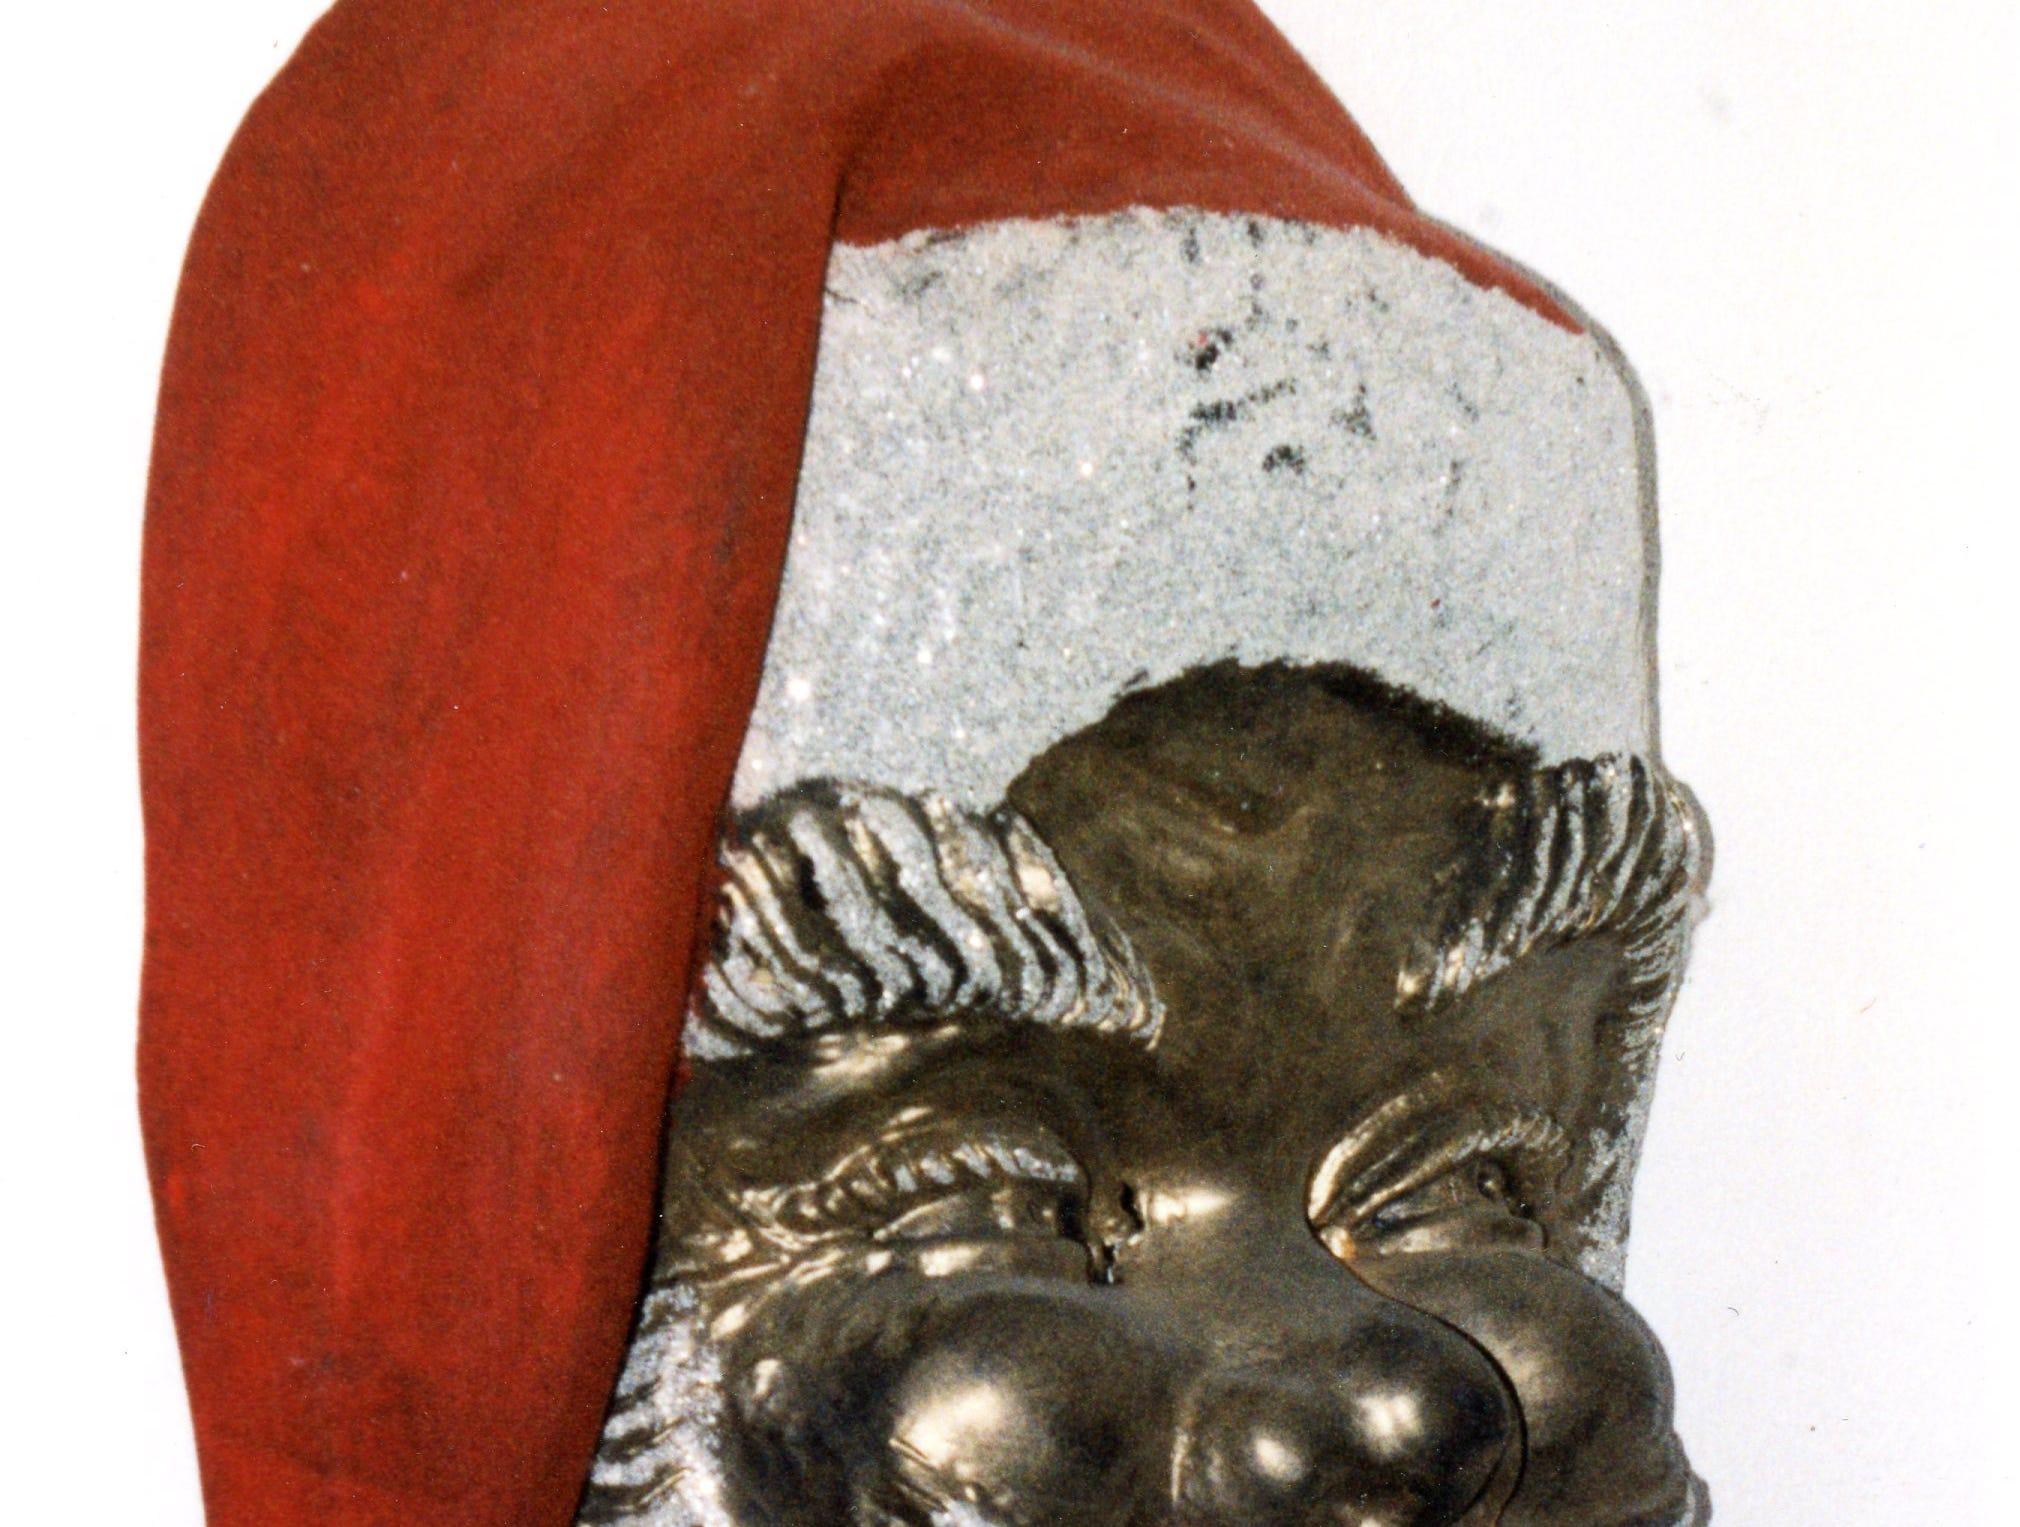 A Santa mask from Knapp's, 1970.